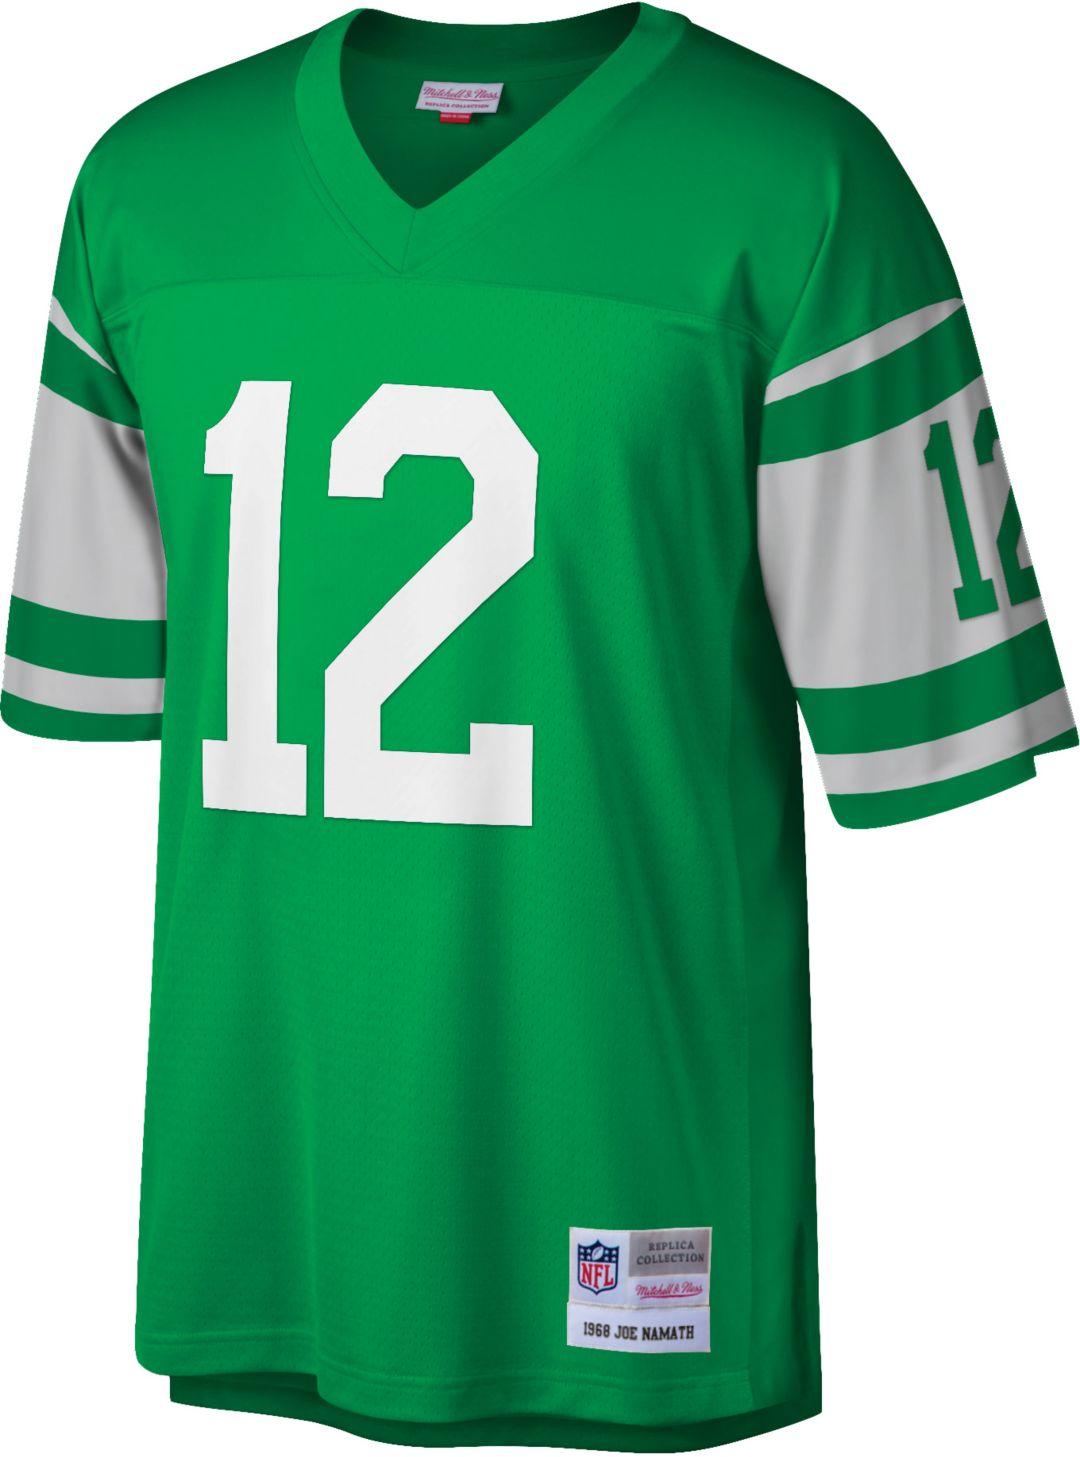 newest aca53 74fe3 Mitchell & Ness Men's 1968 Game Jersey New York Jets Joe Namath #12